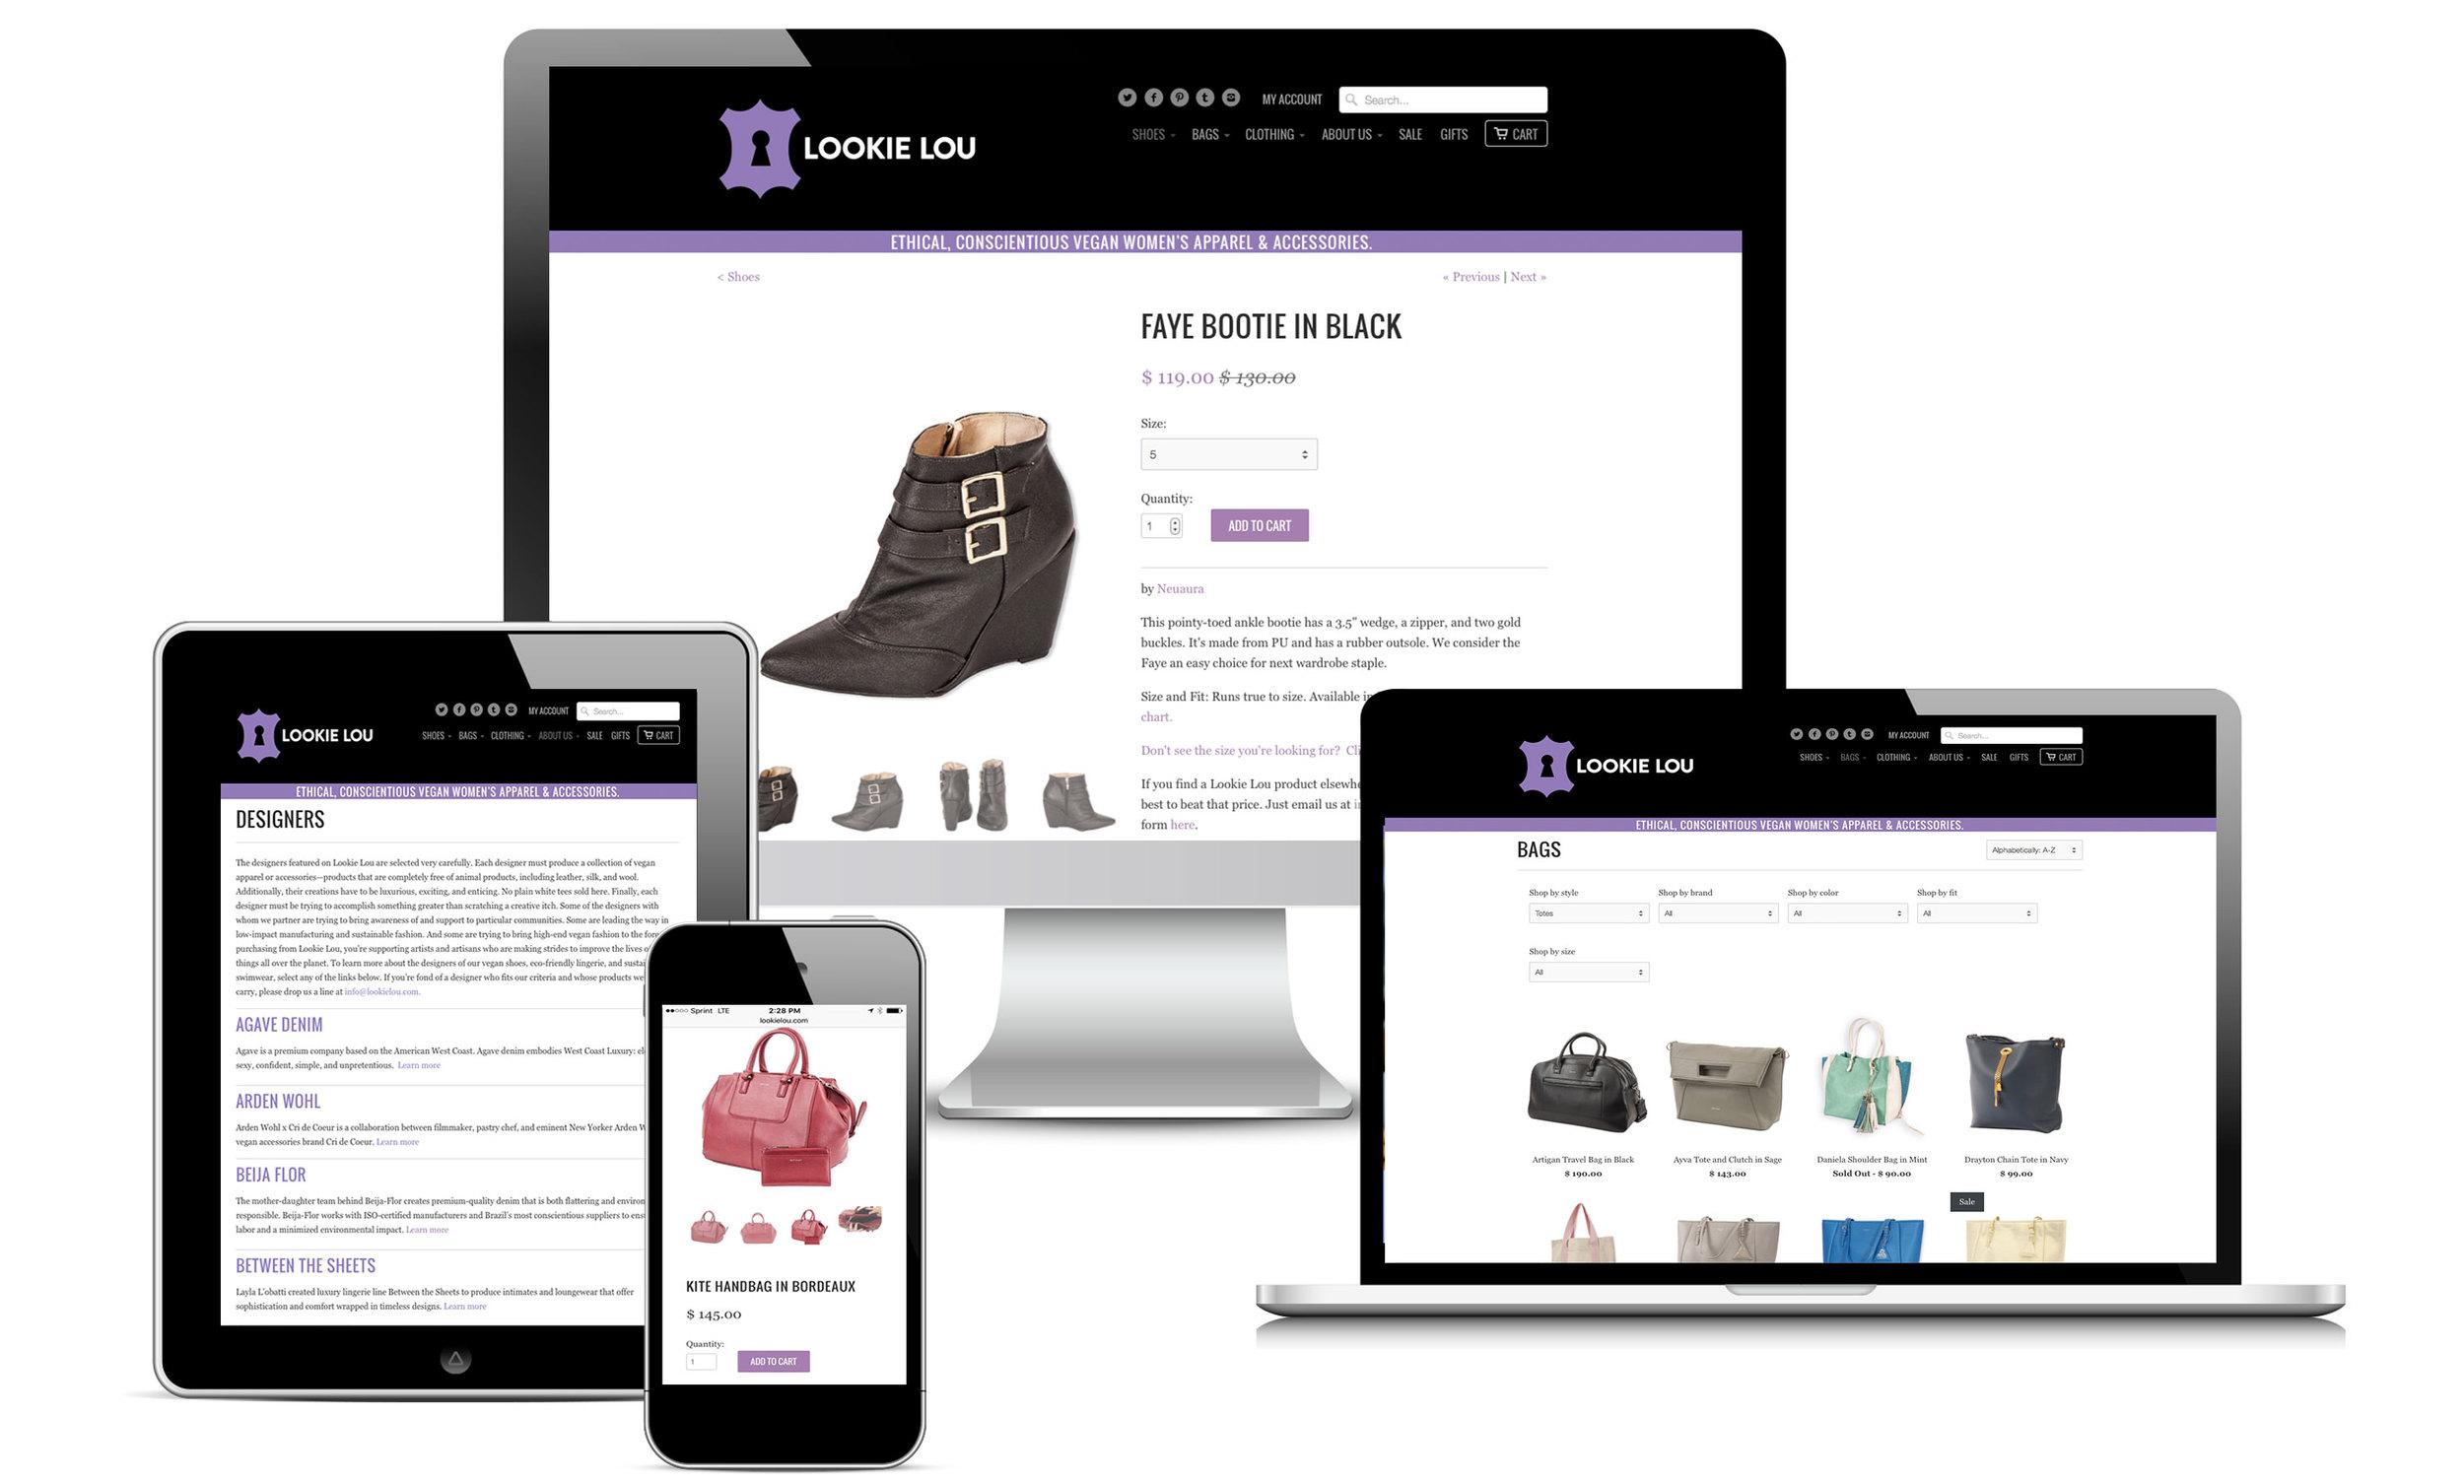 boutique-online-store-ecommerce-websites-design-development